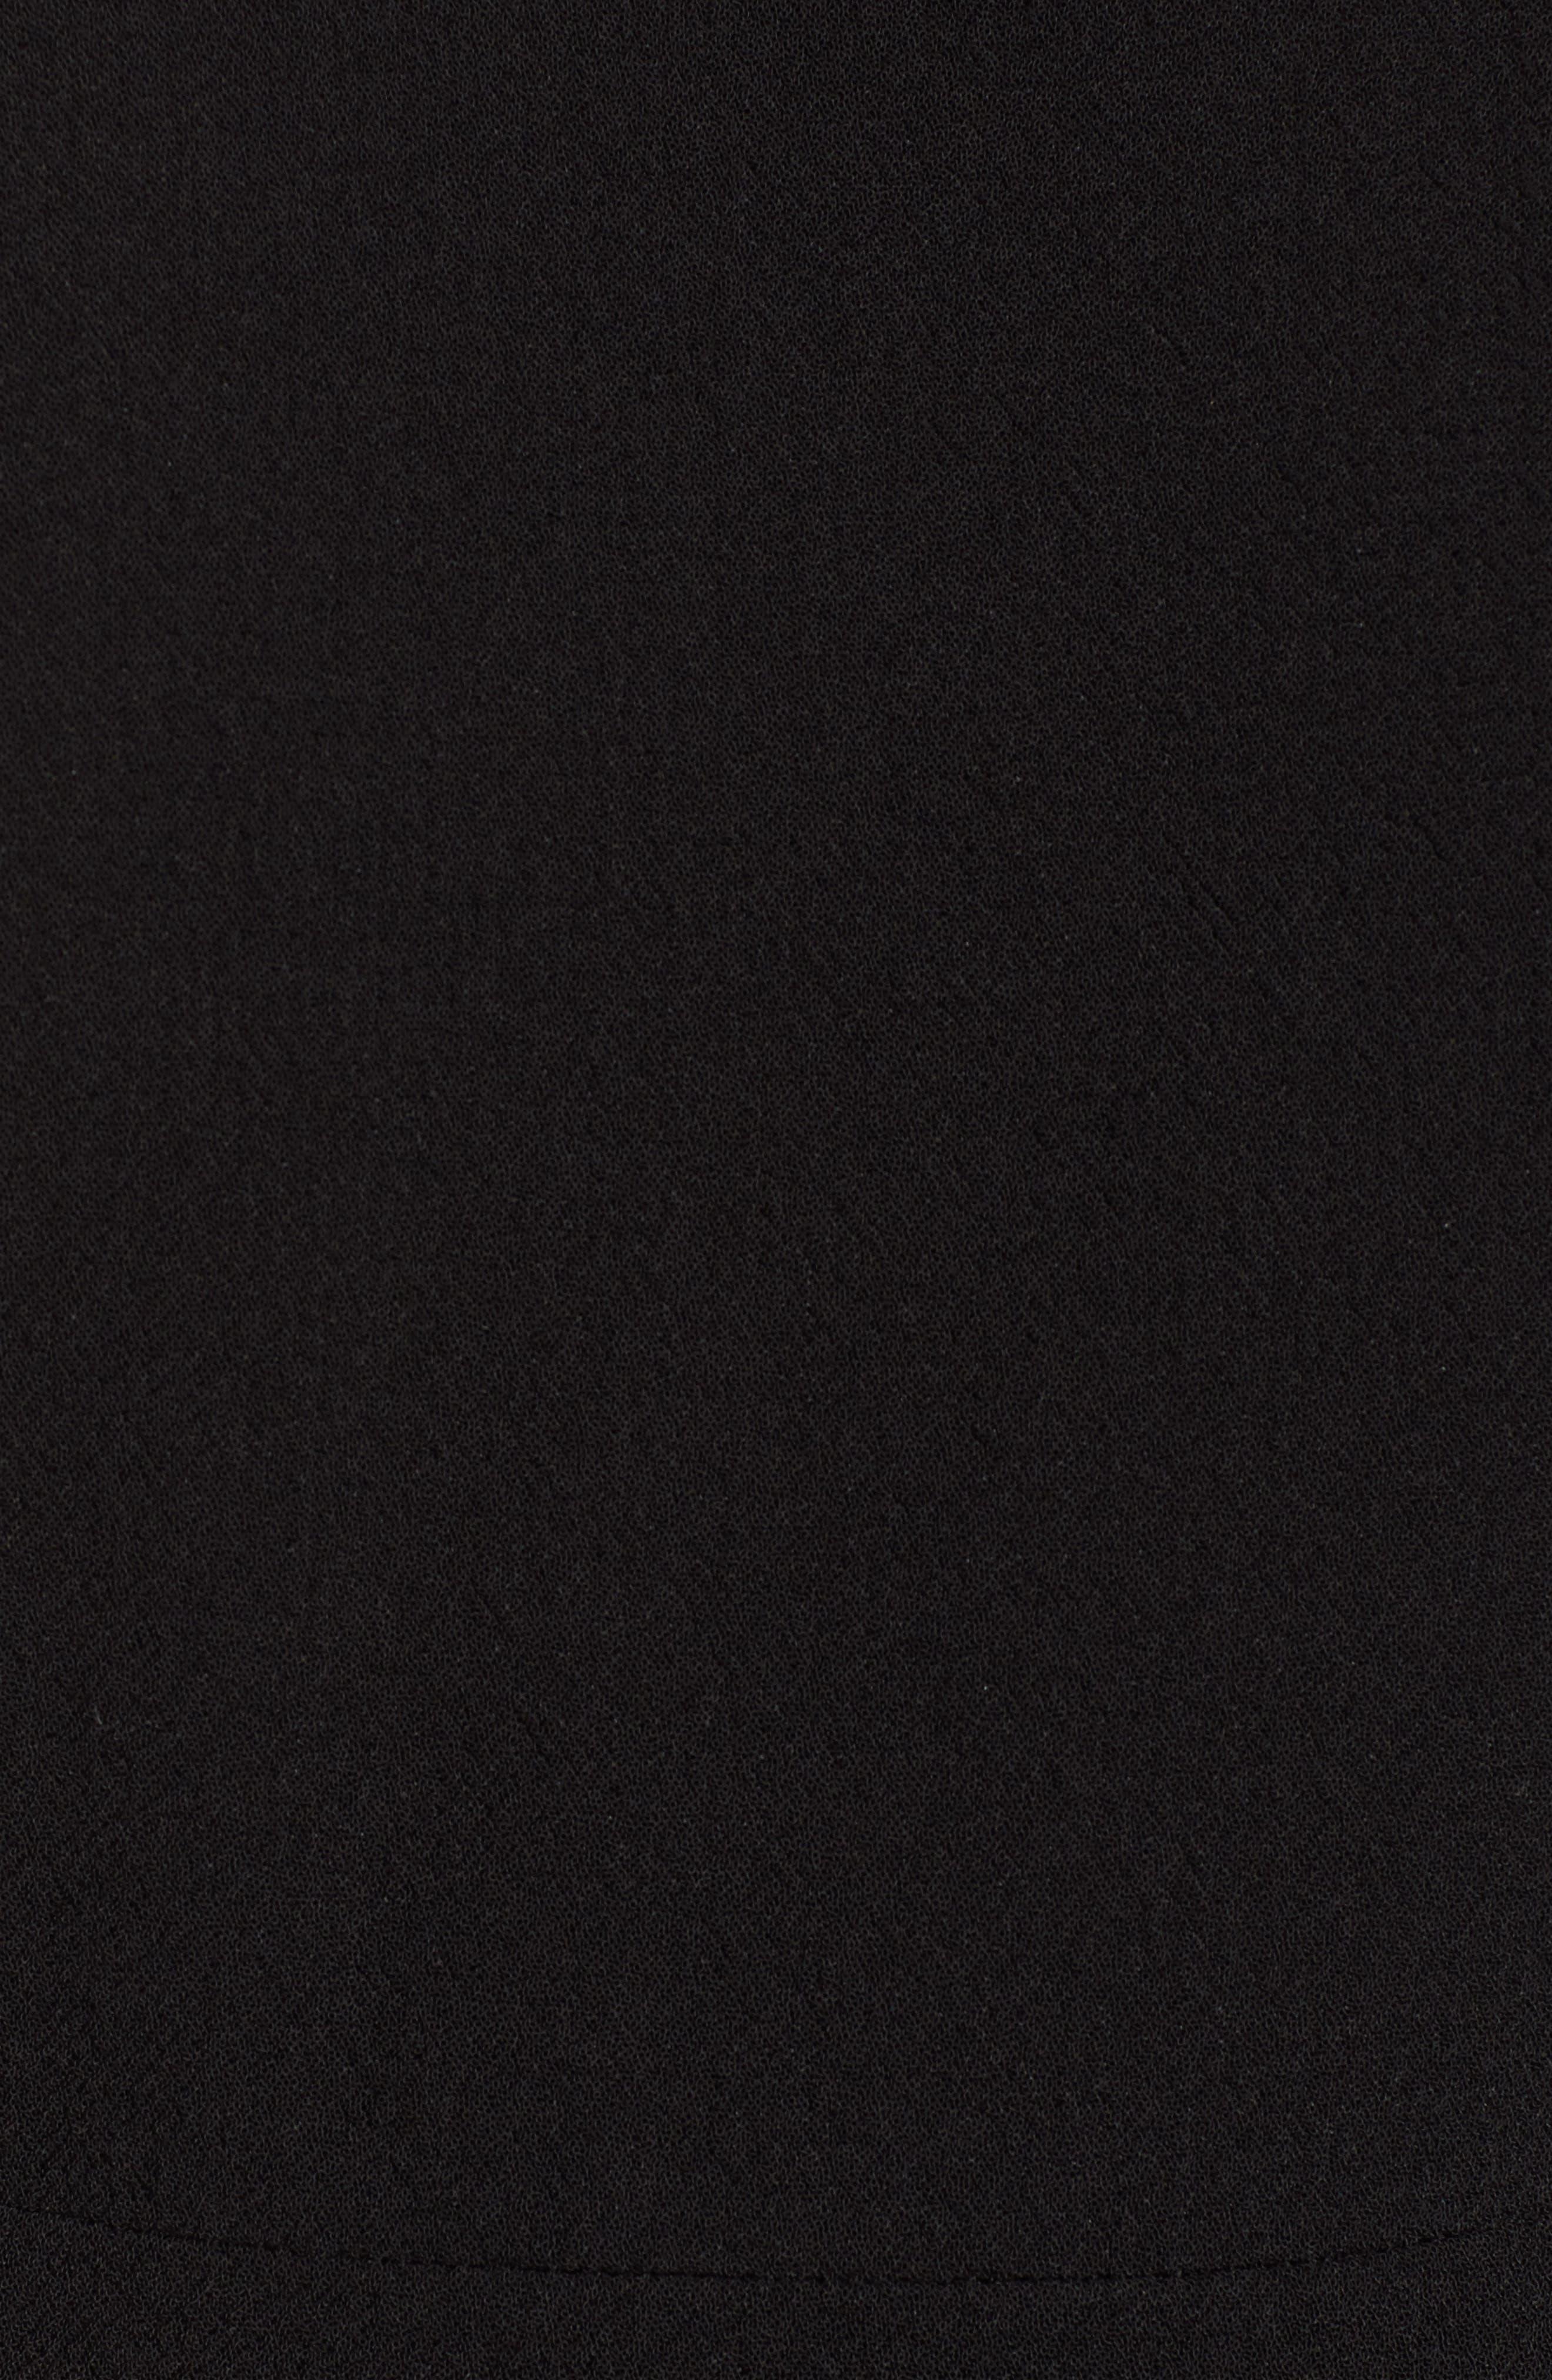 Ruffle Front Dress,                             Alternate thumbnail 6, color,                             Black